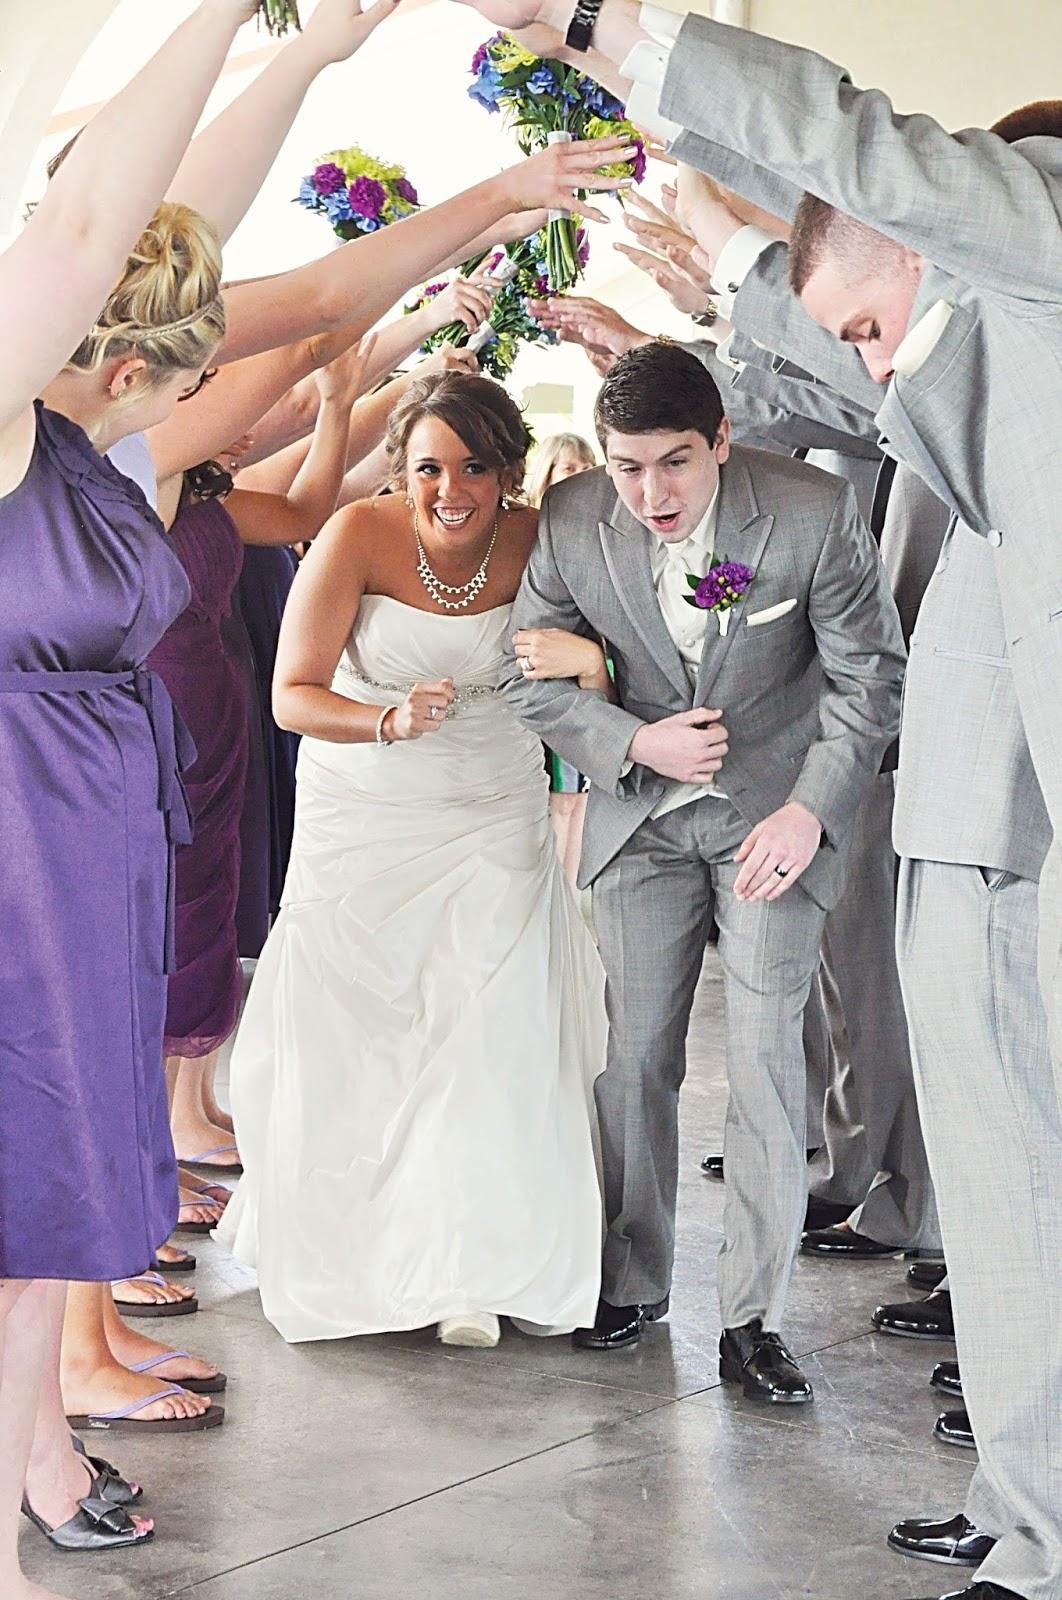 Emejing Funny Wedding Entrance Ideas Images - Styles & Ideas 2018 ...